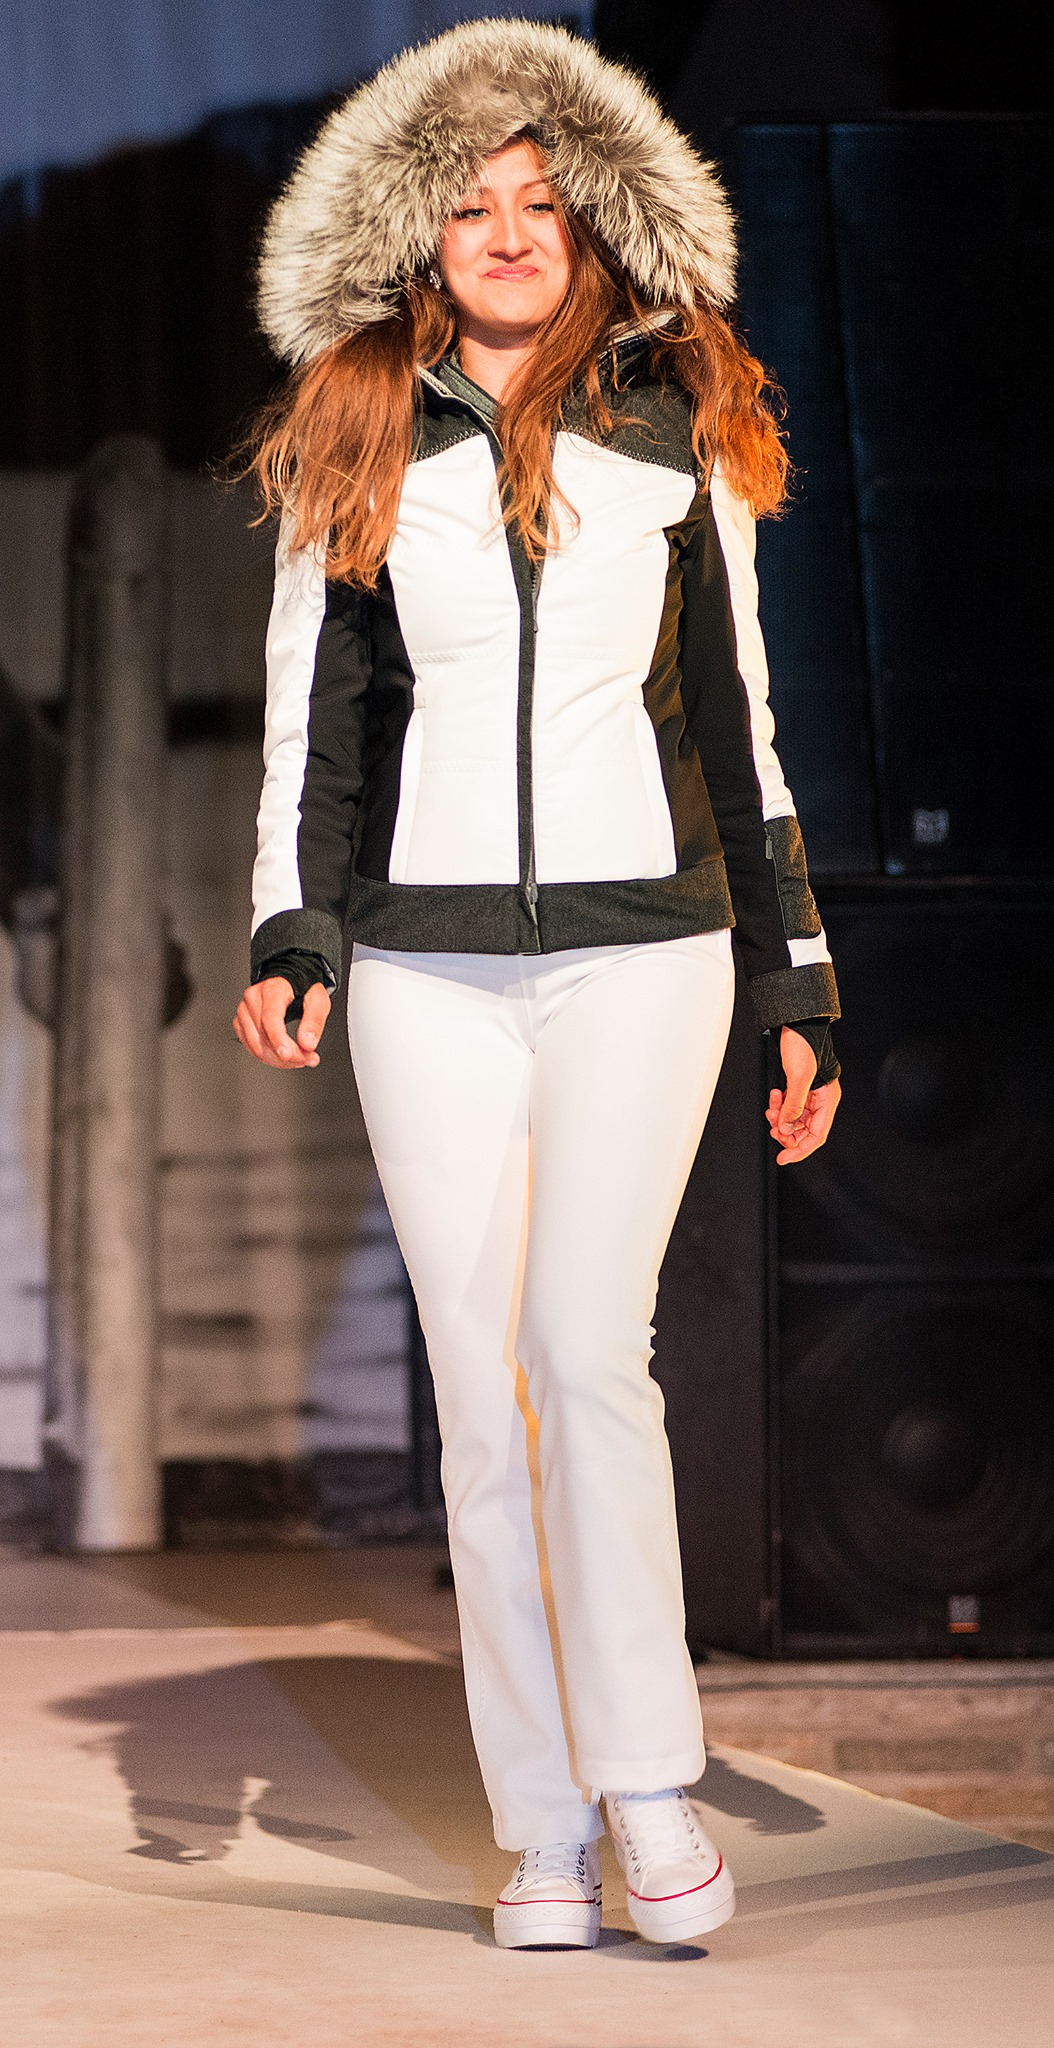 sfilata botteroski vernante 2016 abbigliamento sci